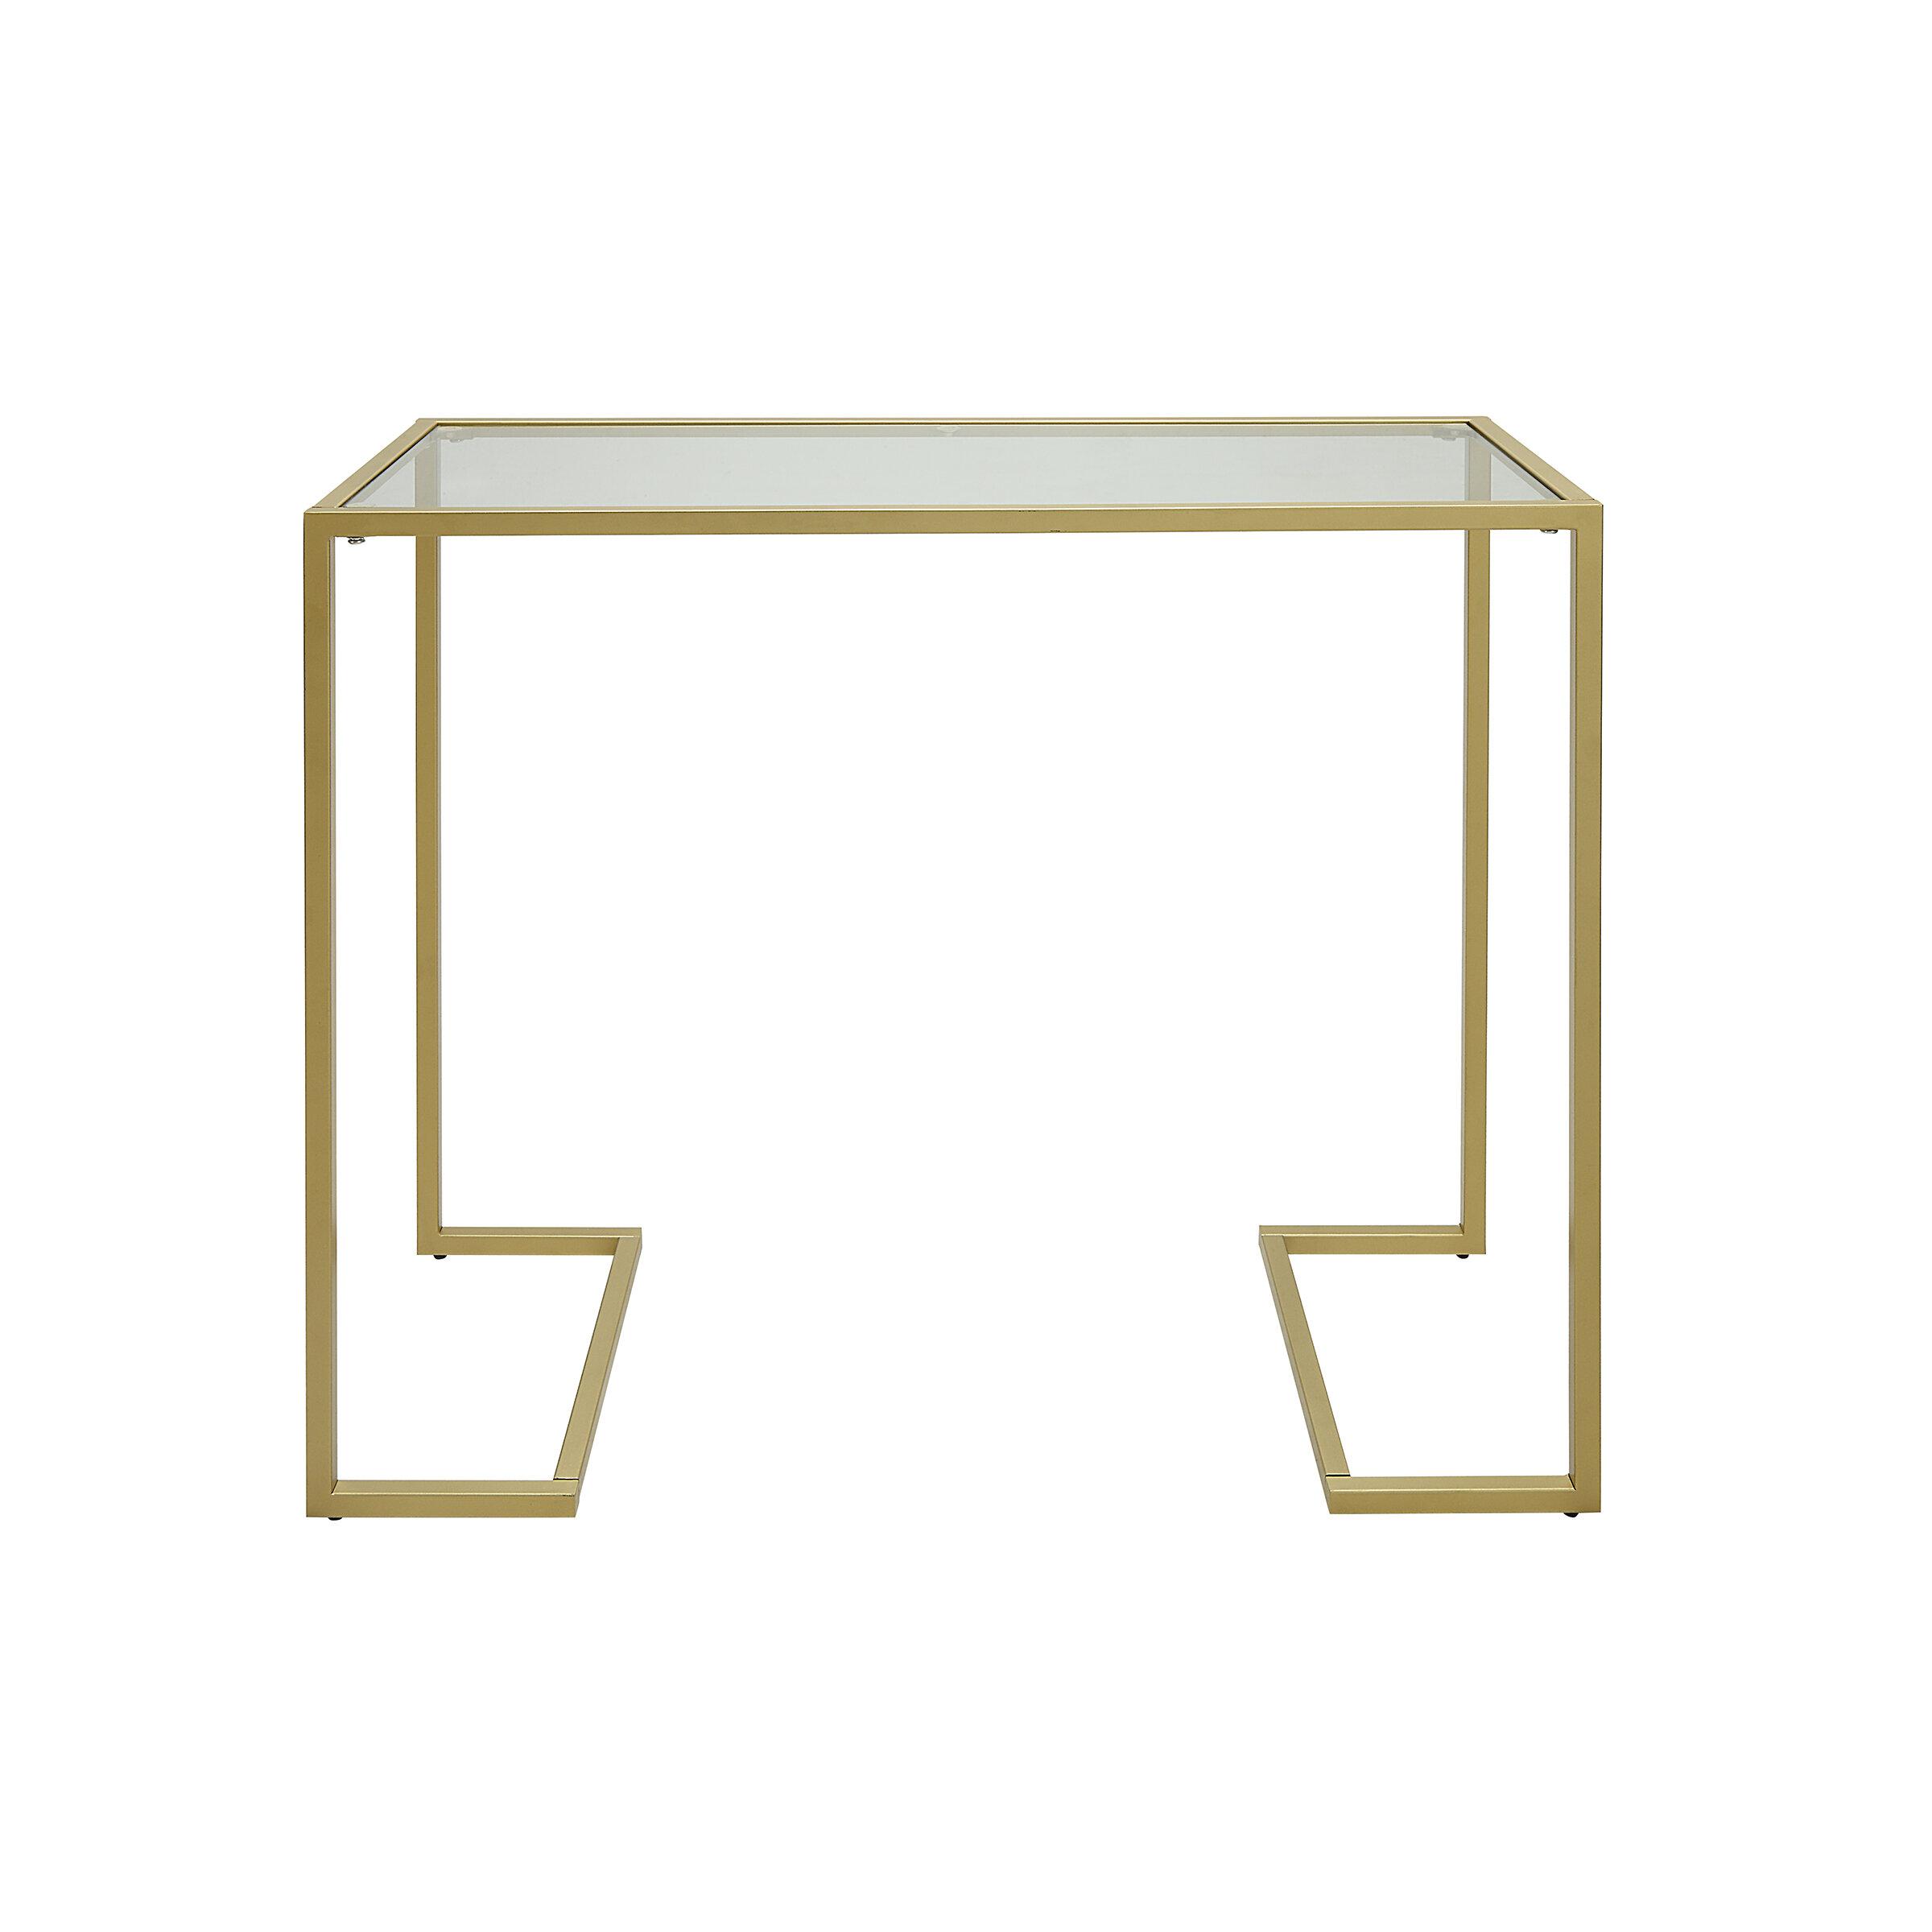 Zipcode Design Royalston 38 Glass Top Console Table Reviews Wayfair